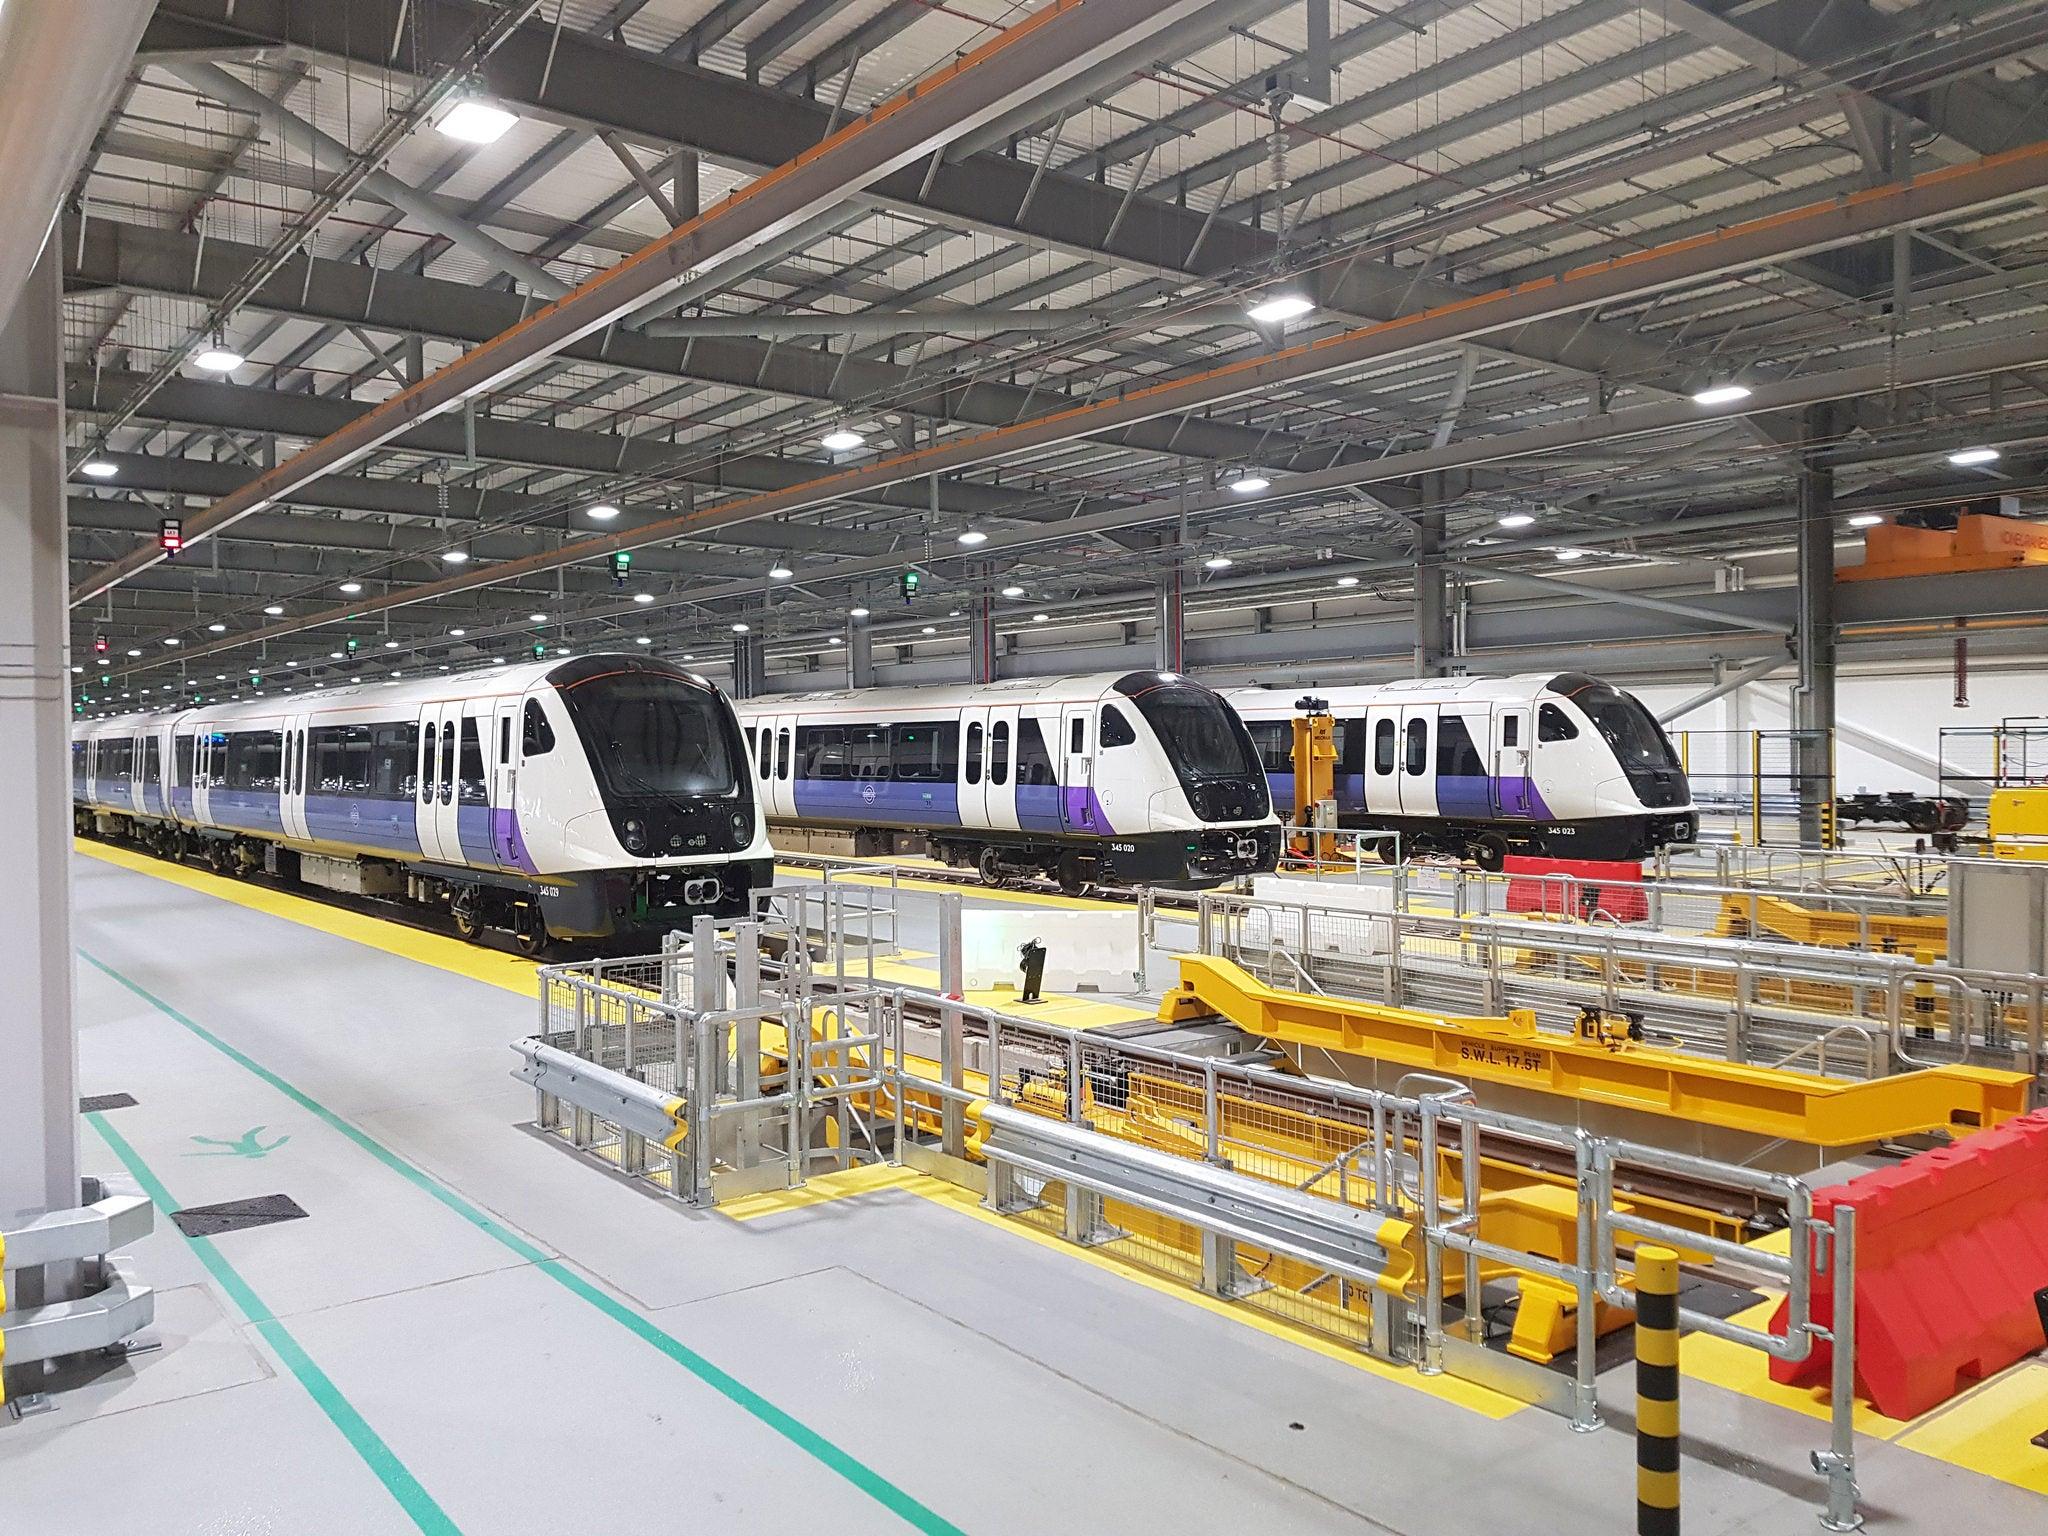 Trains on the Elizabeth Line - The Fifteen Billion Pound Railway